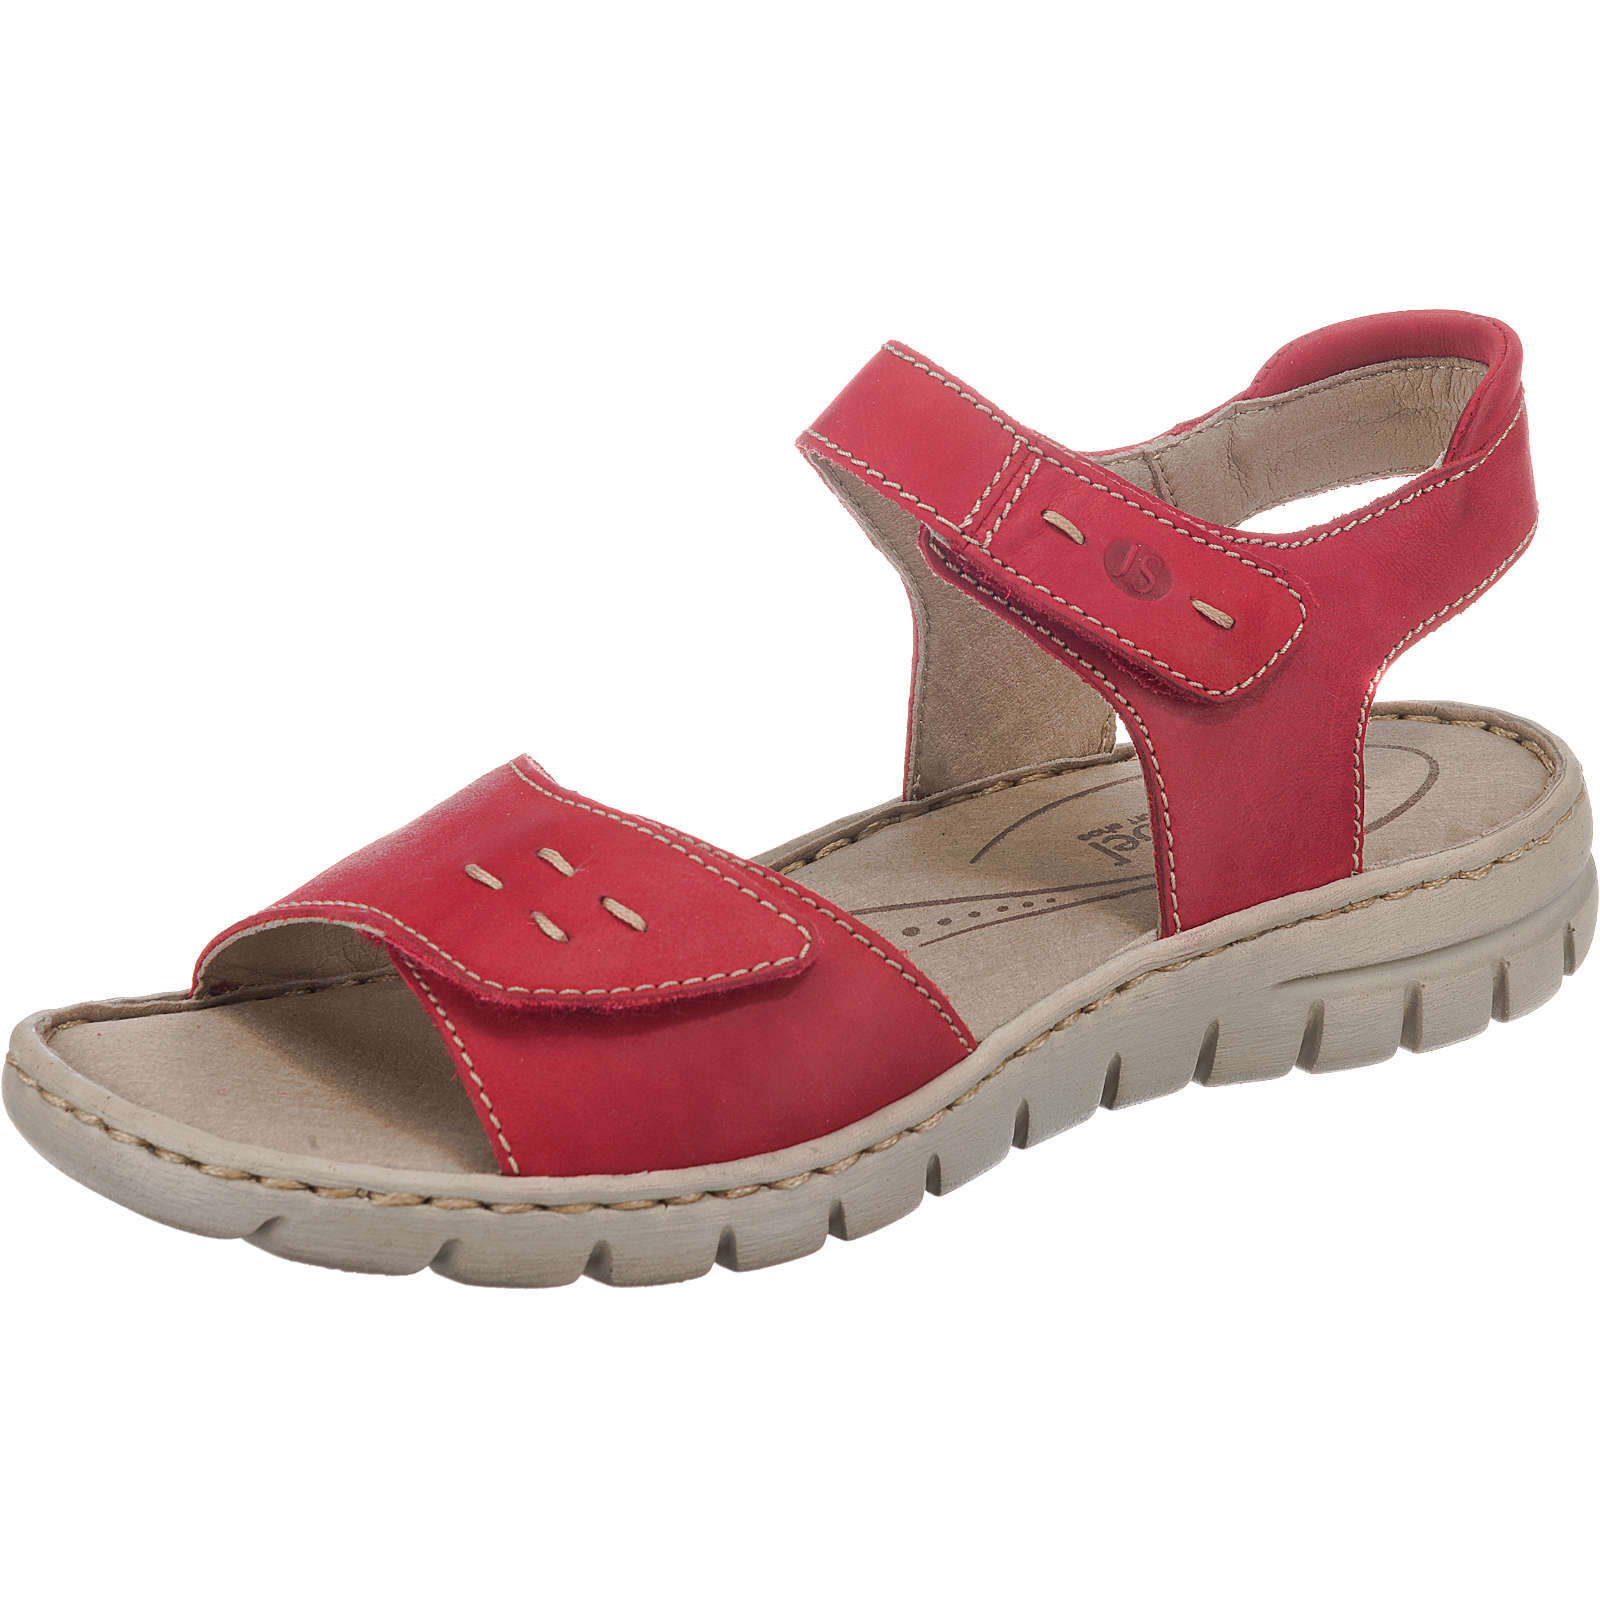 Josef Seibel Stefanie 21 Klassische Sandalen rot Damen Gr. 36